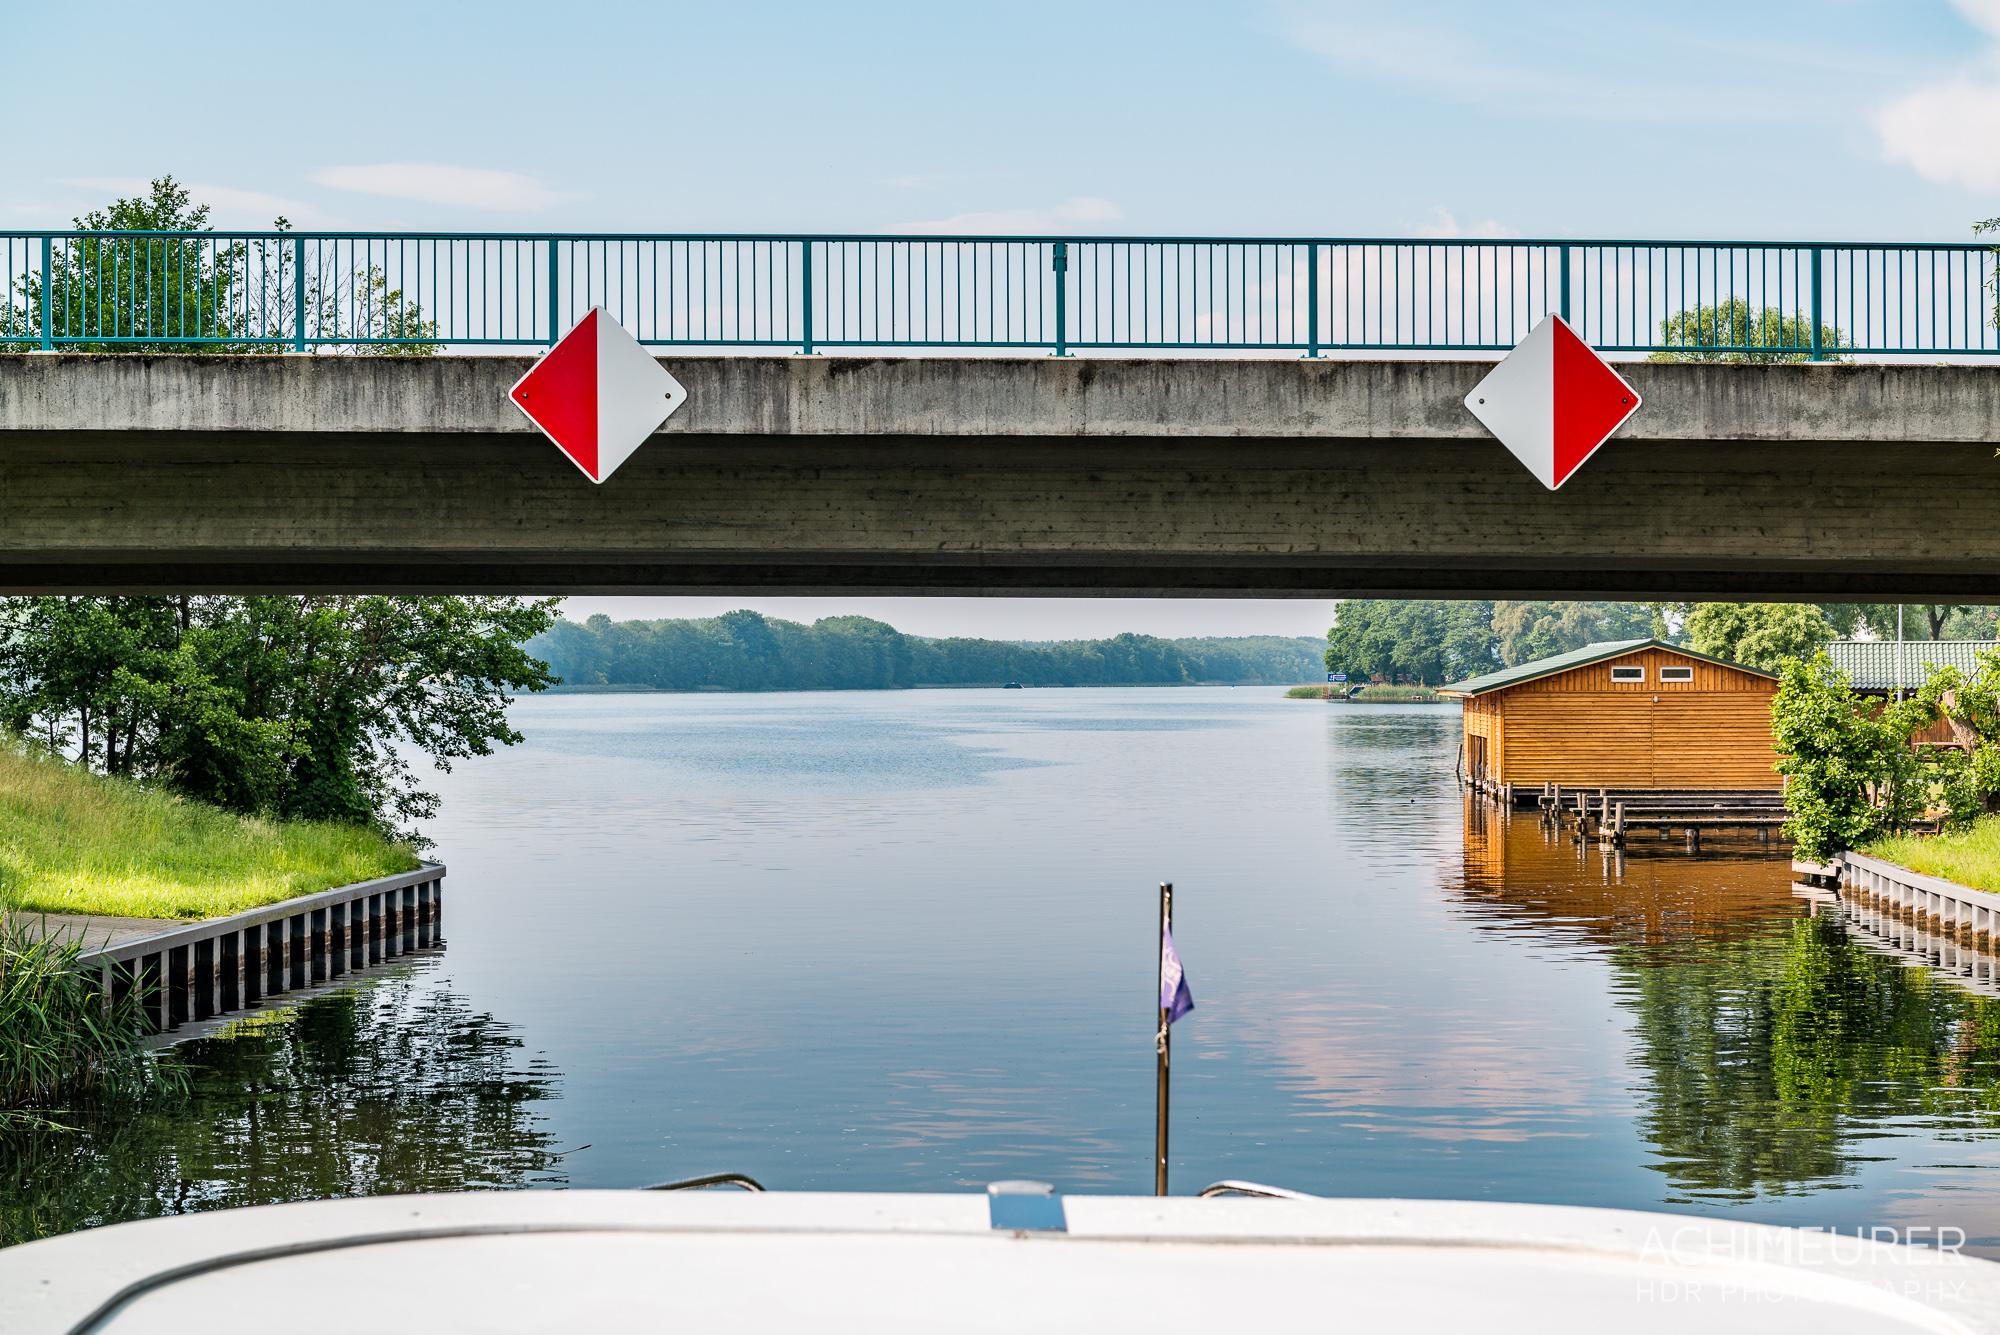 Hausboot-Kuhnle-Mueritz-Mecklenburg-Vorpommern-See_2615